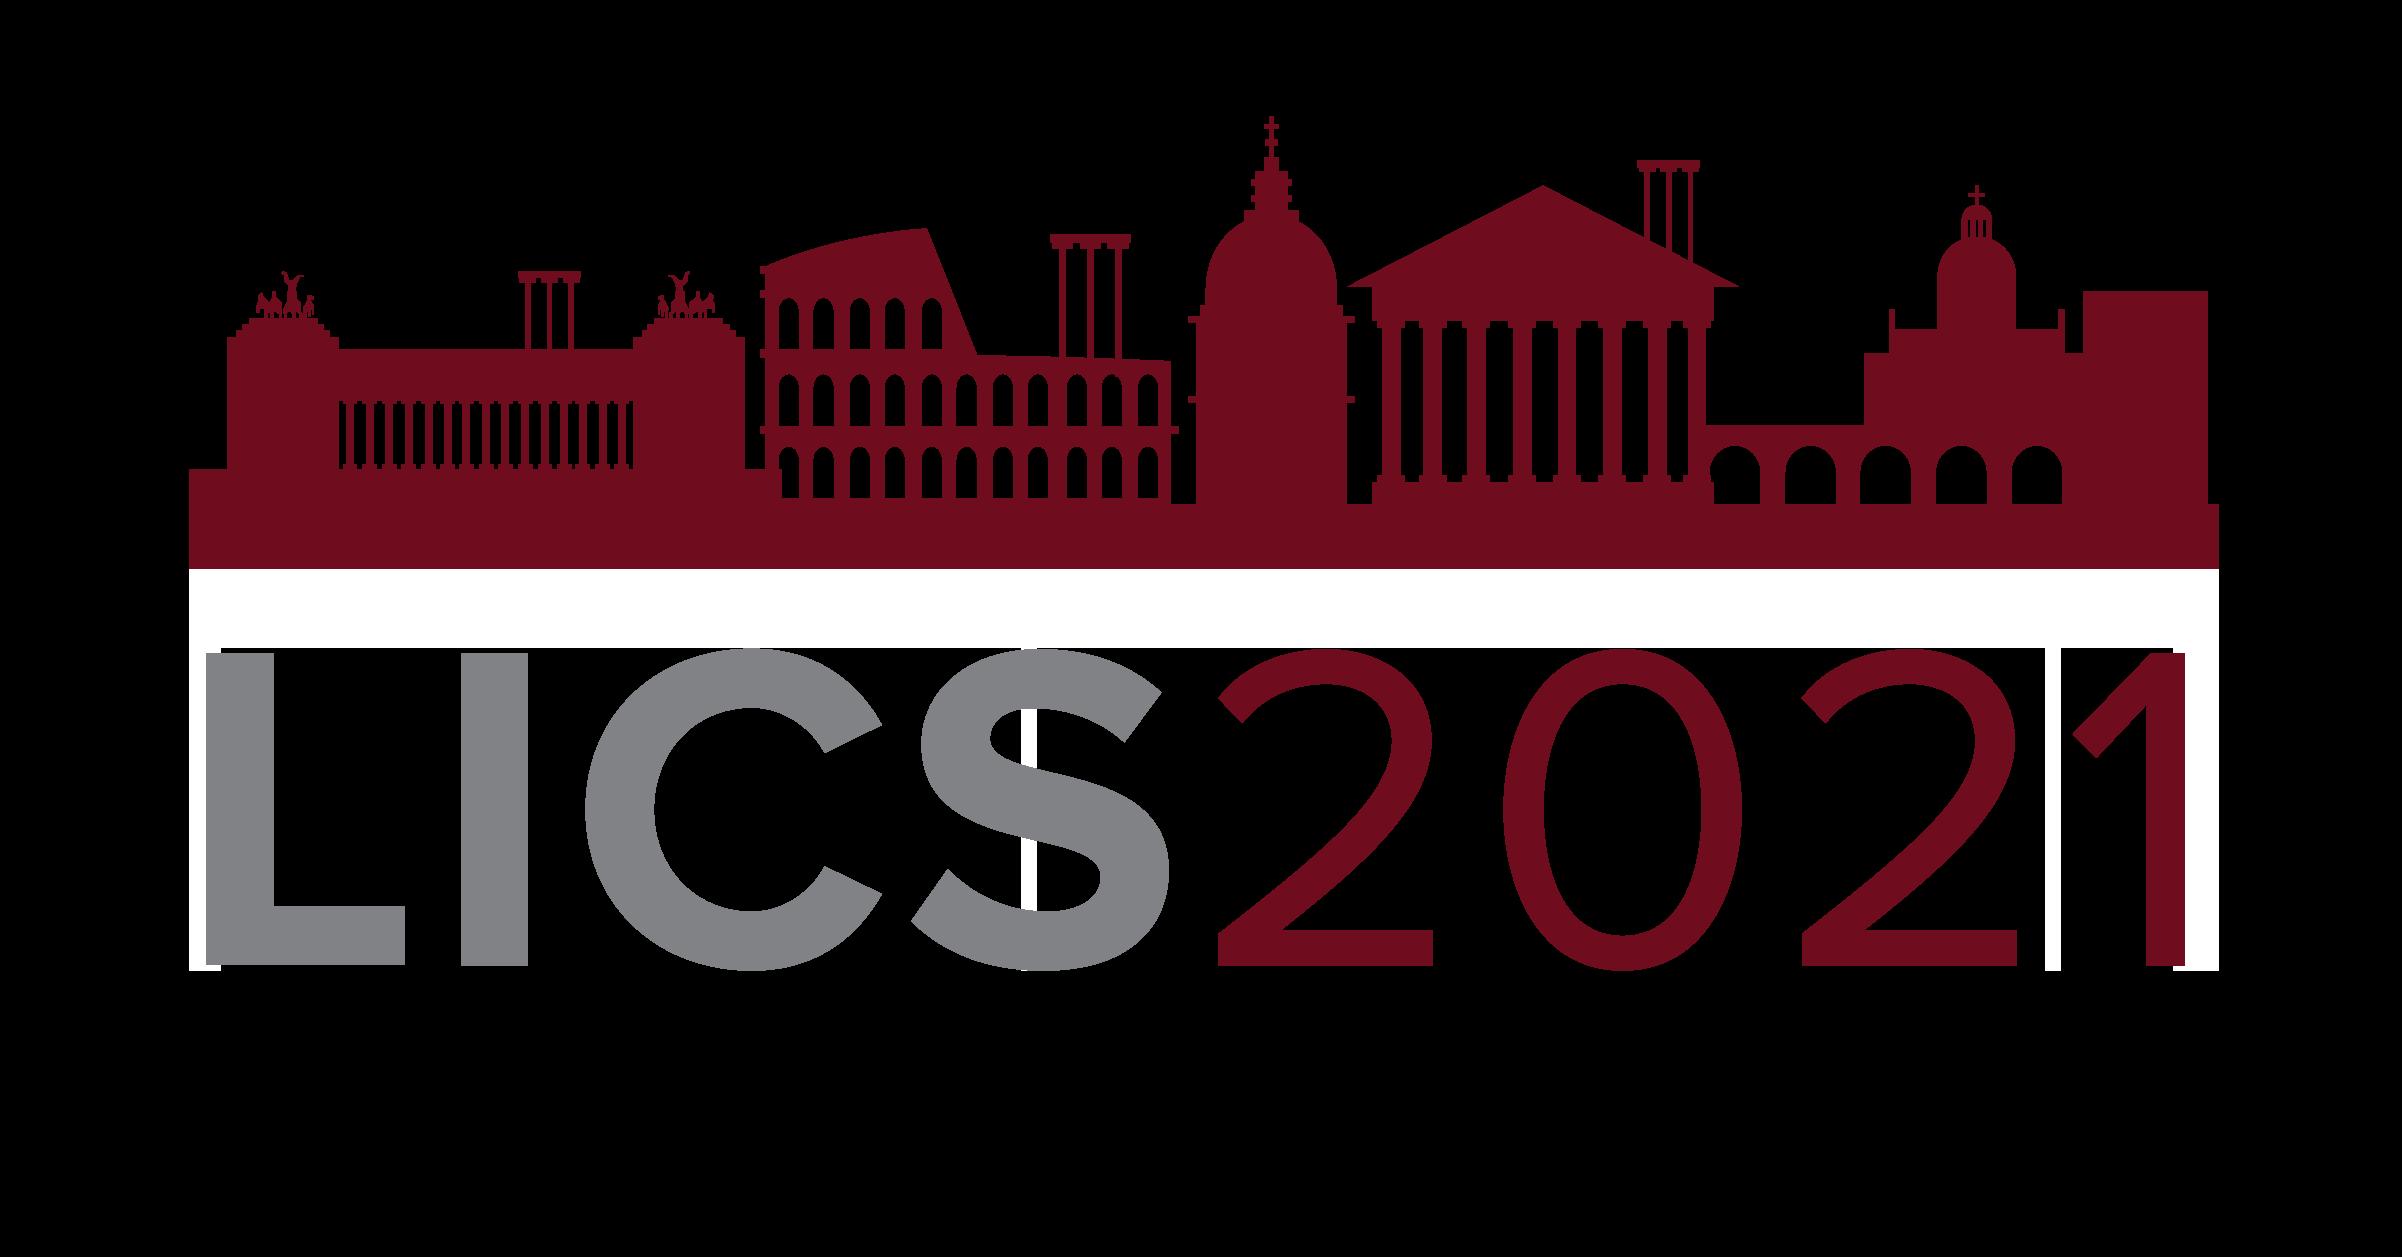 LICS 2021